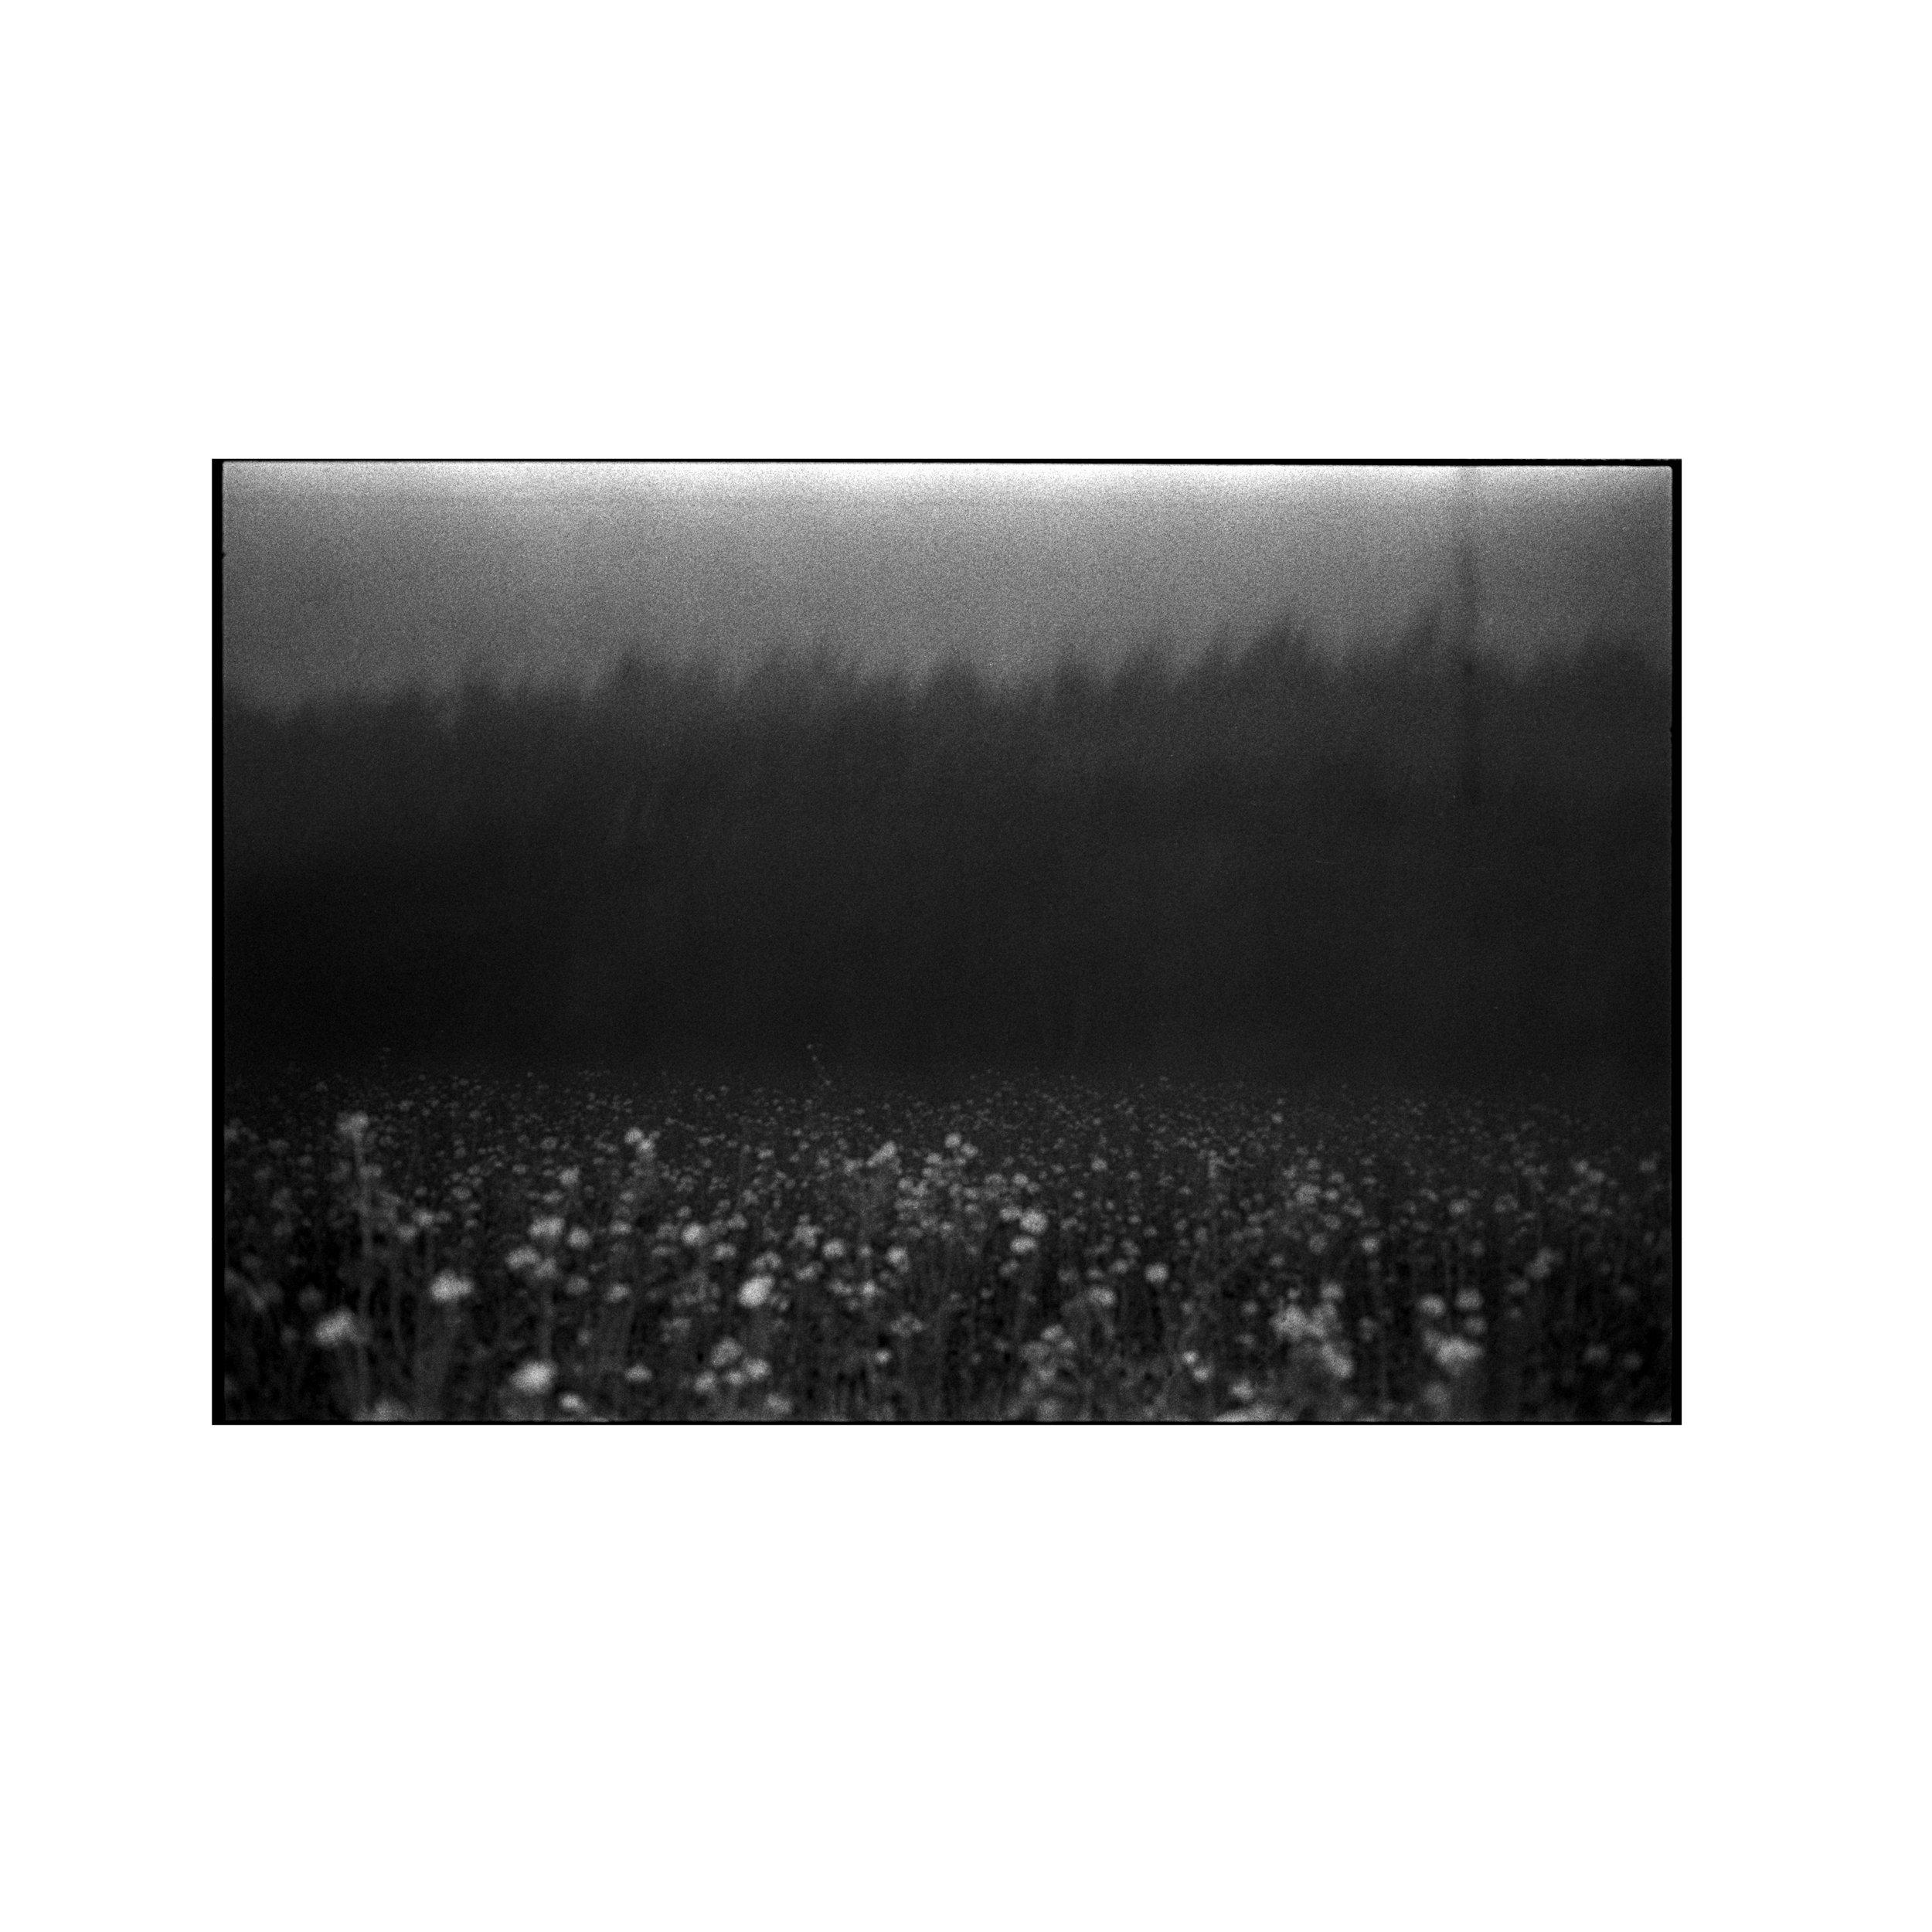 Samana, Samana music, Analogue Photography, Field of Flowers